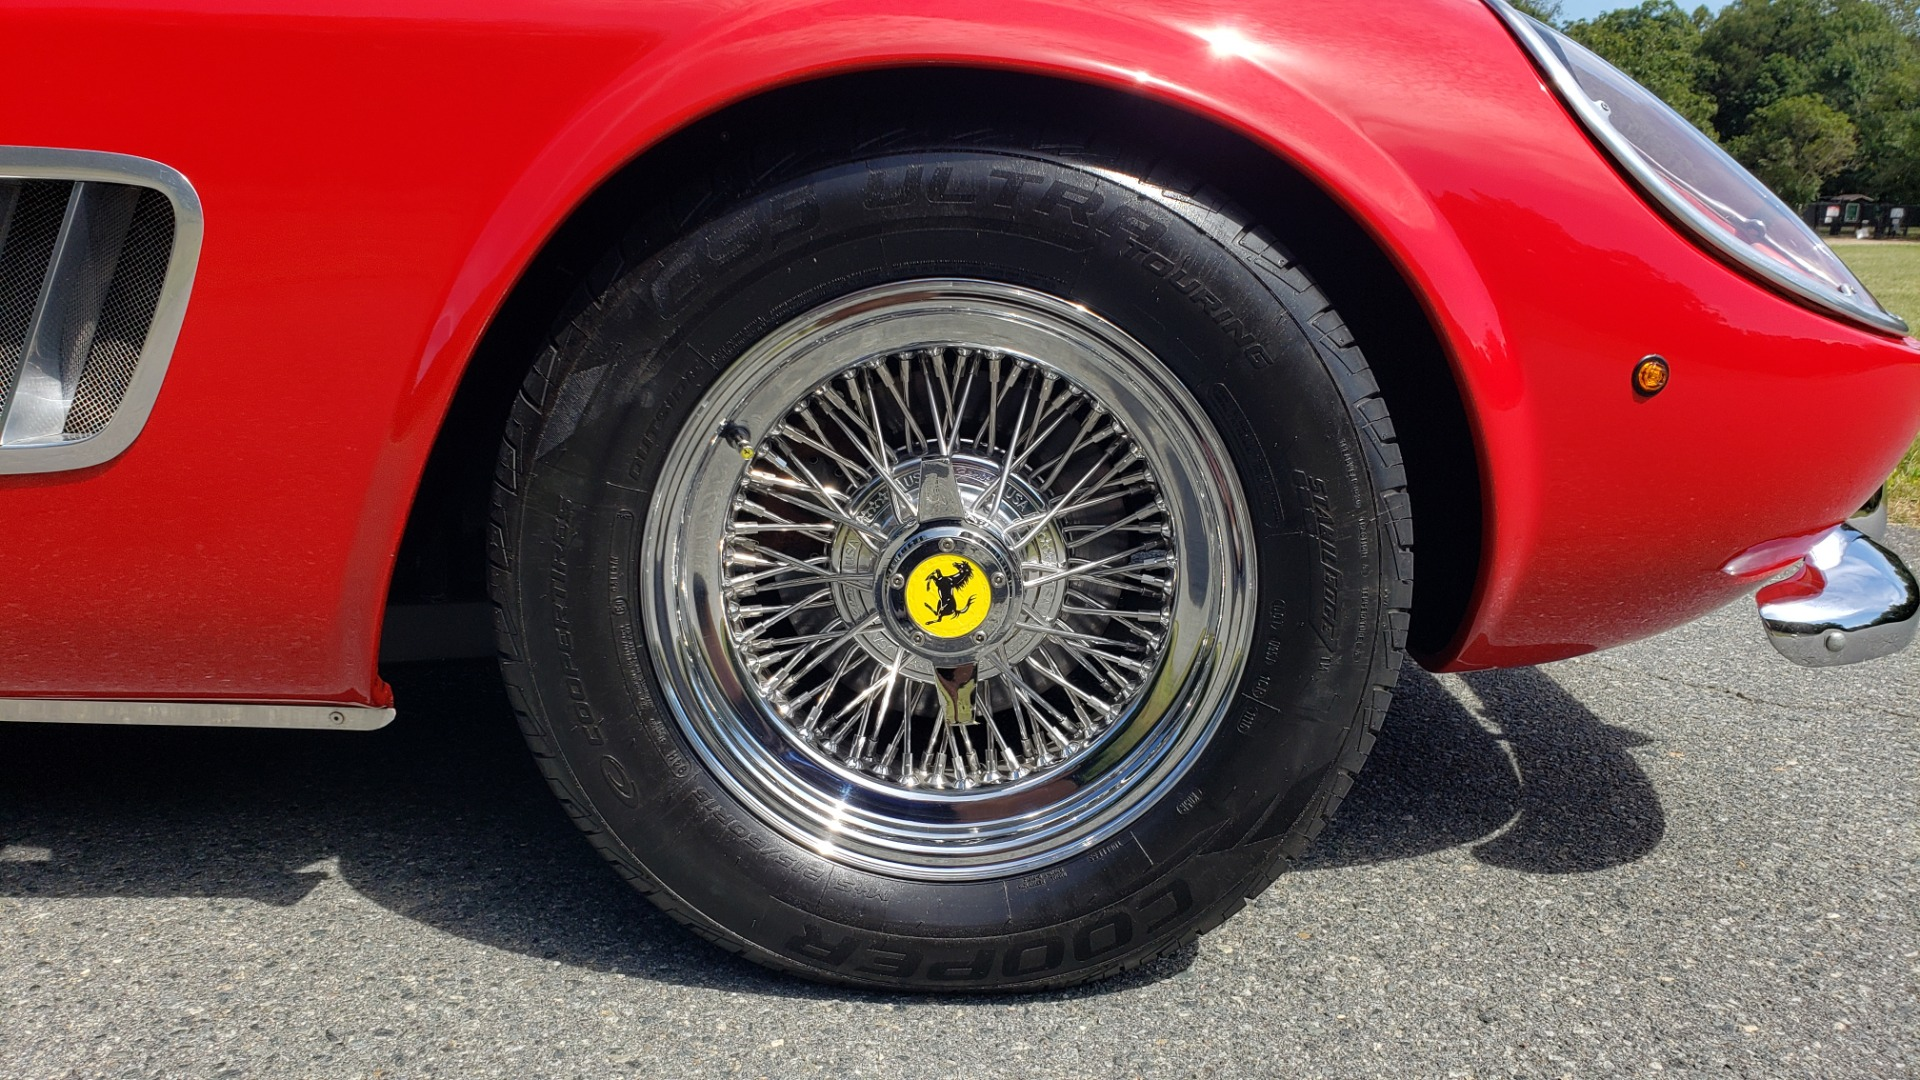 Used 1961 Ferrari 250GT SWB CALIFORNIA REPLICA / 302CI V8 / TREMEC 5-SPEED for sale Sold at Formula Imports in Charlotte NC 28227 59